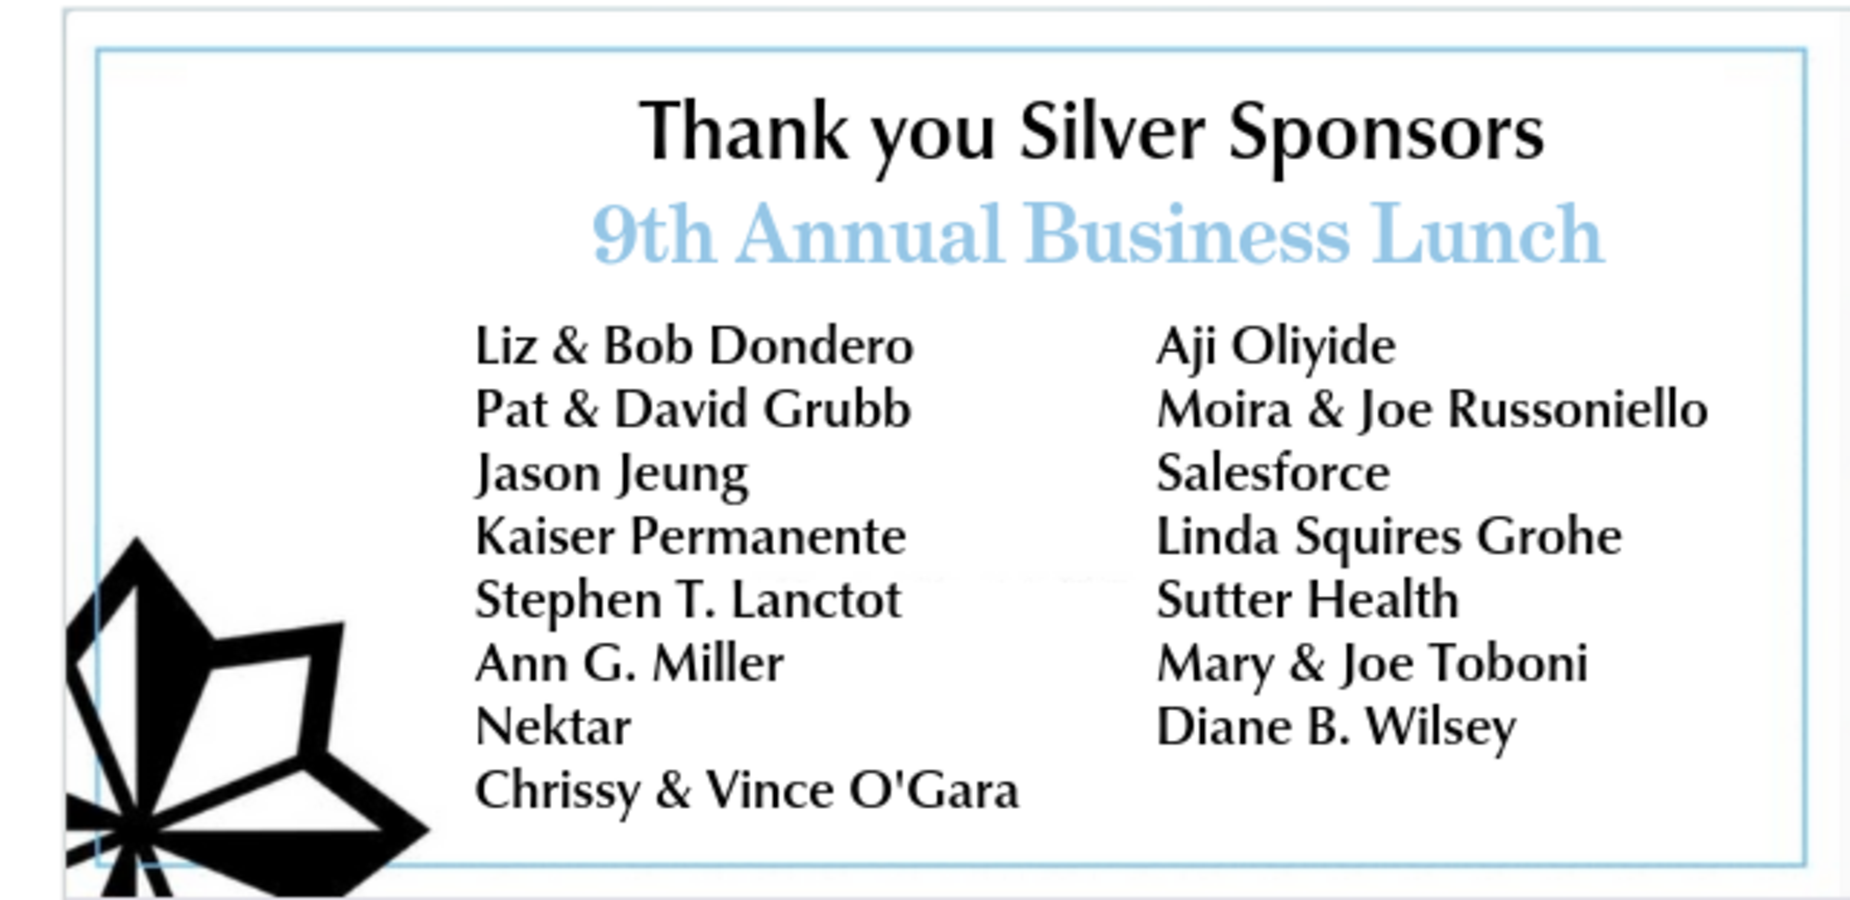 Silver sponsor list